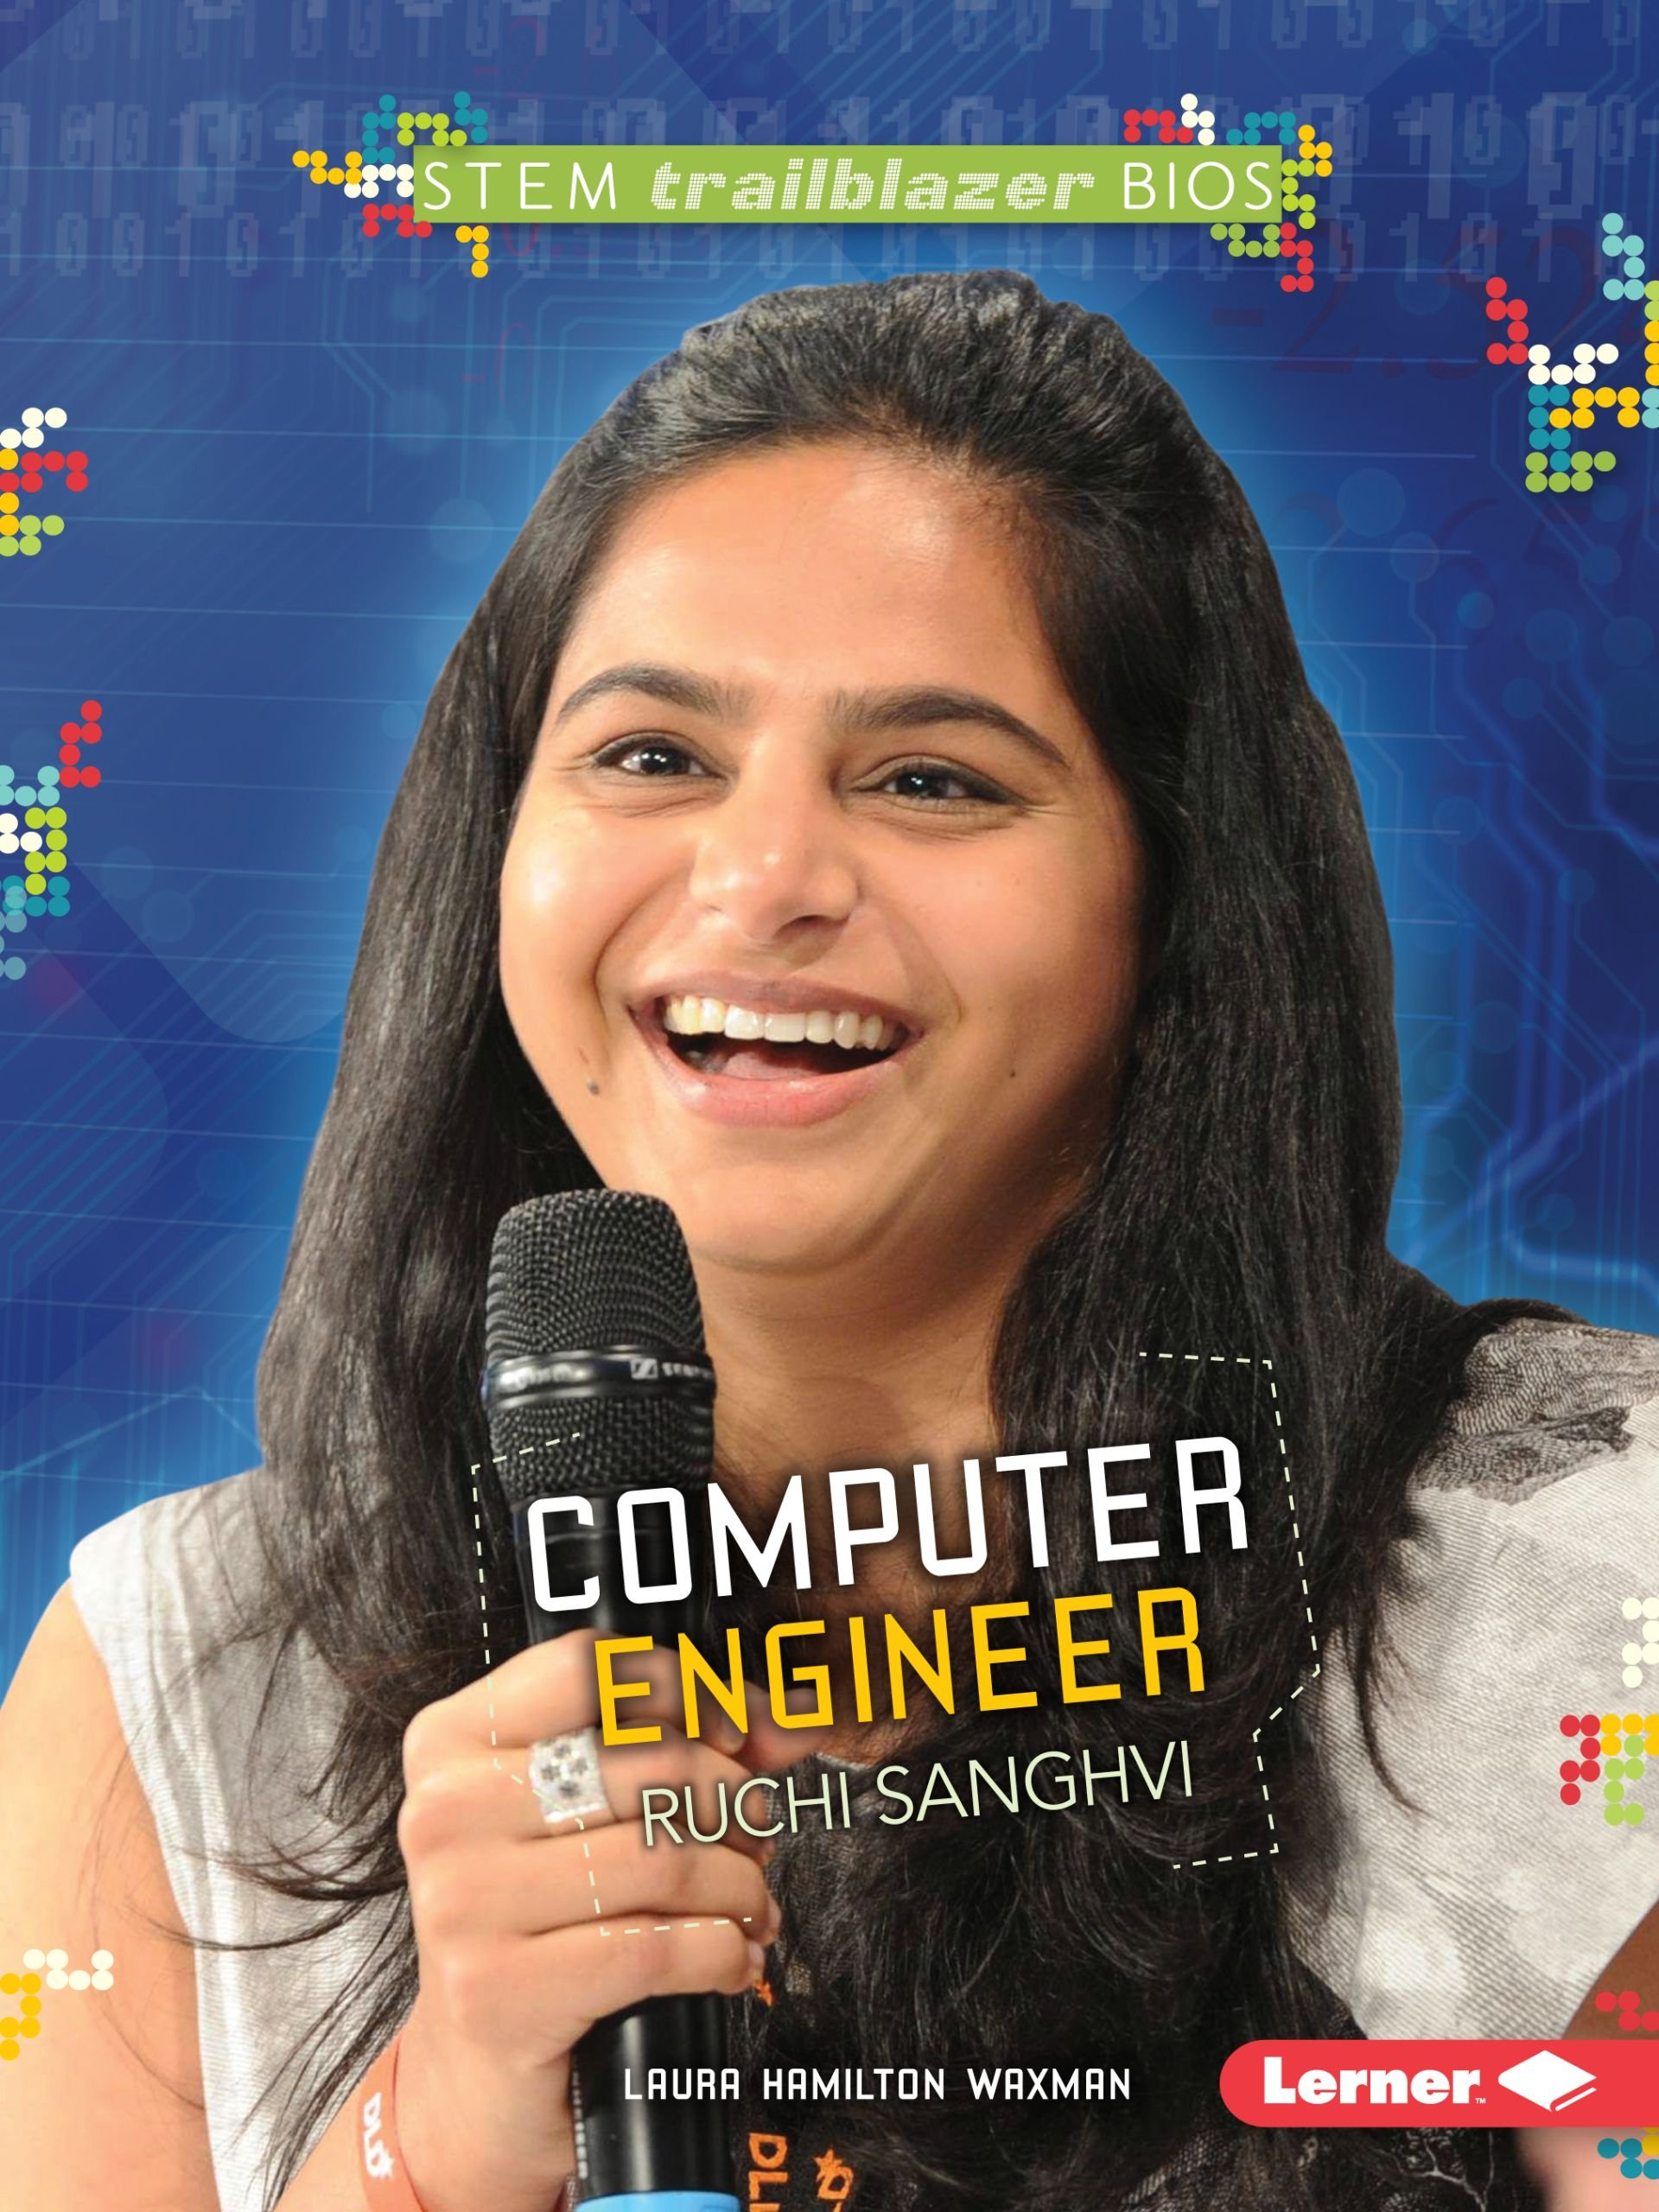 Download Computer Engineer Ruchi Sanghvi (STEM Trailblazer Bios) PDF